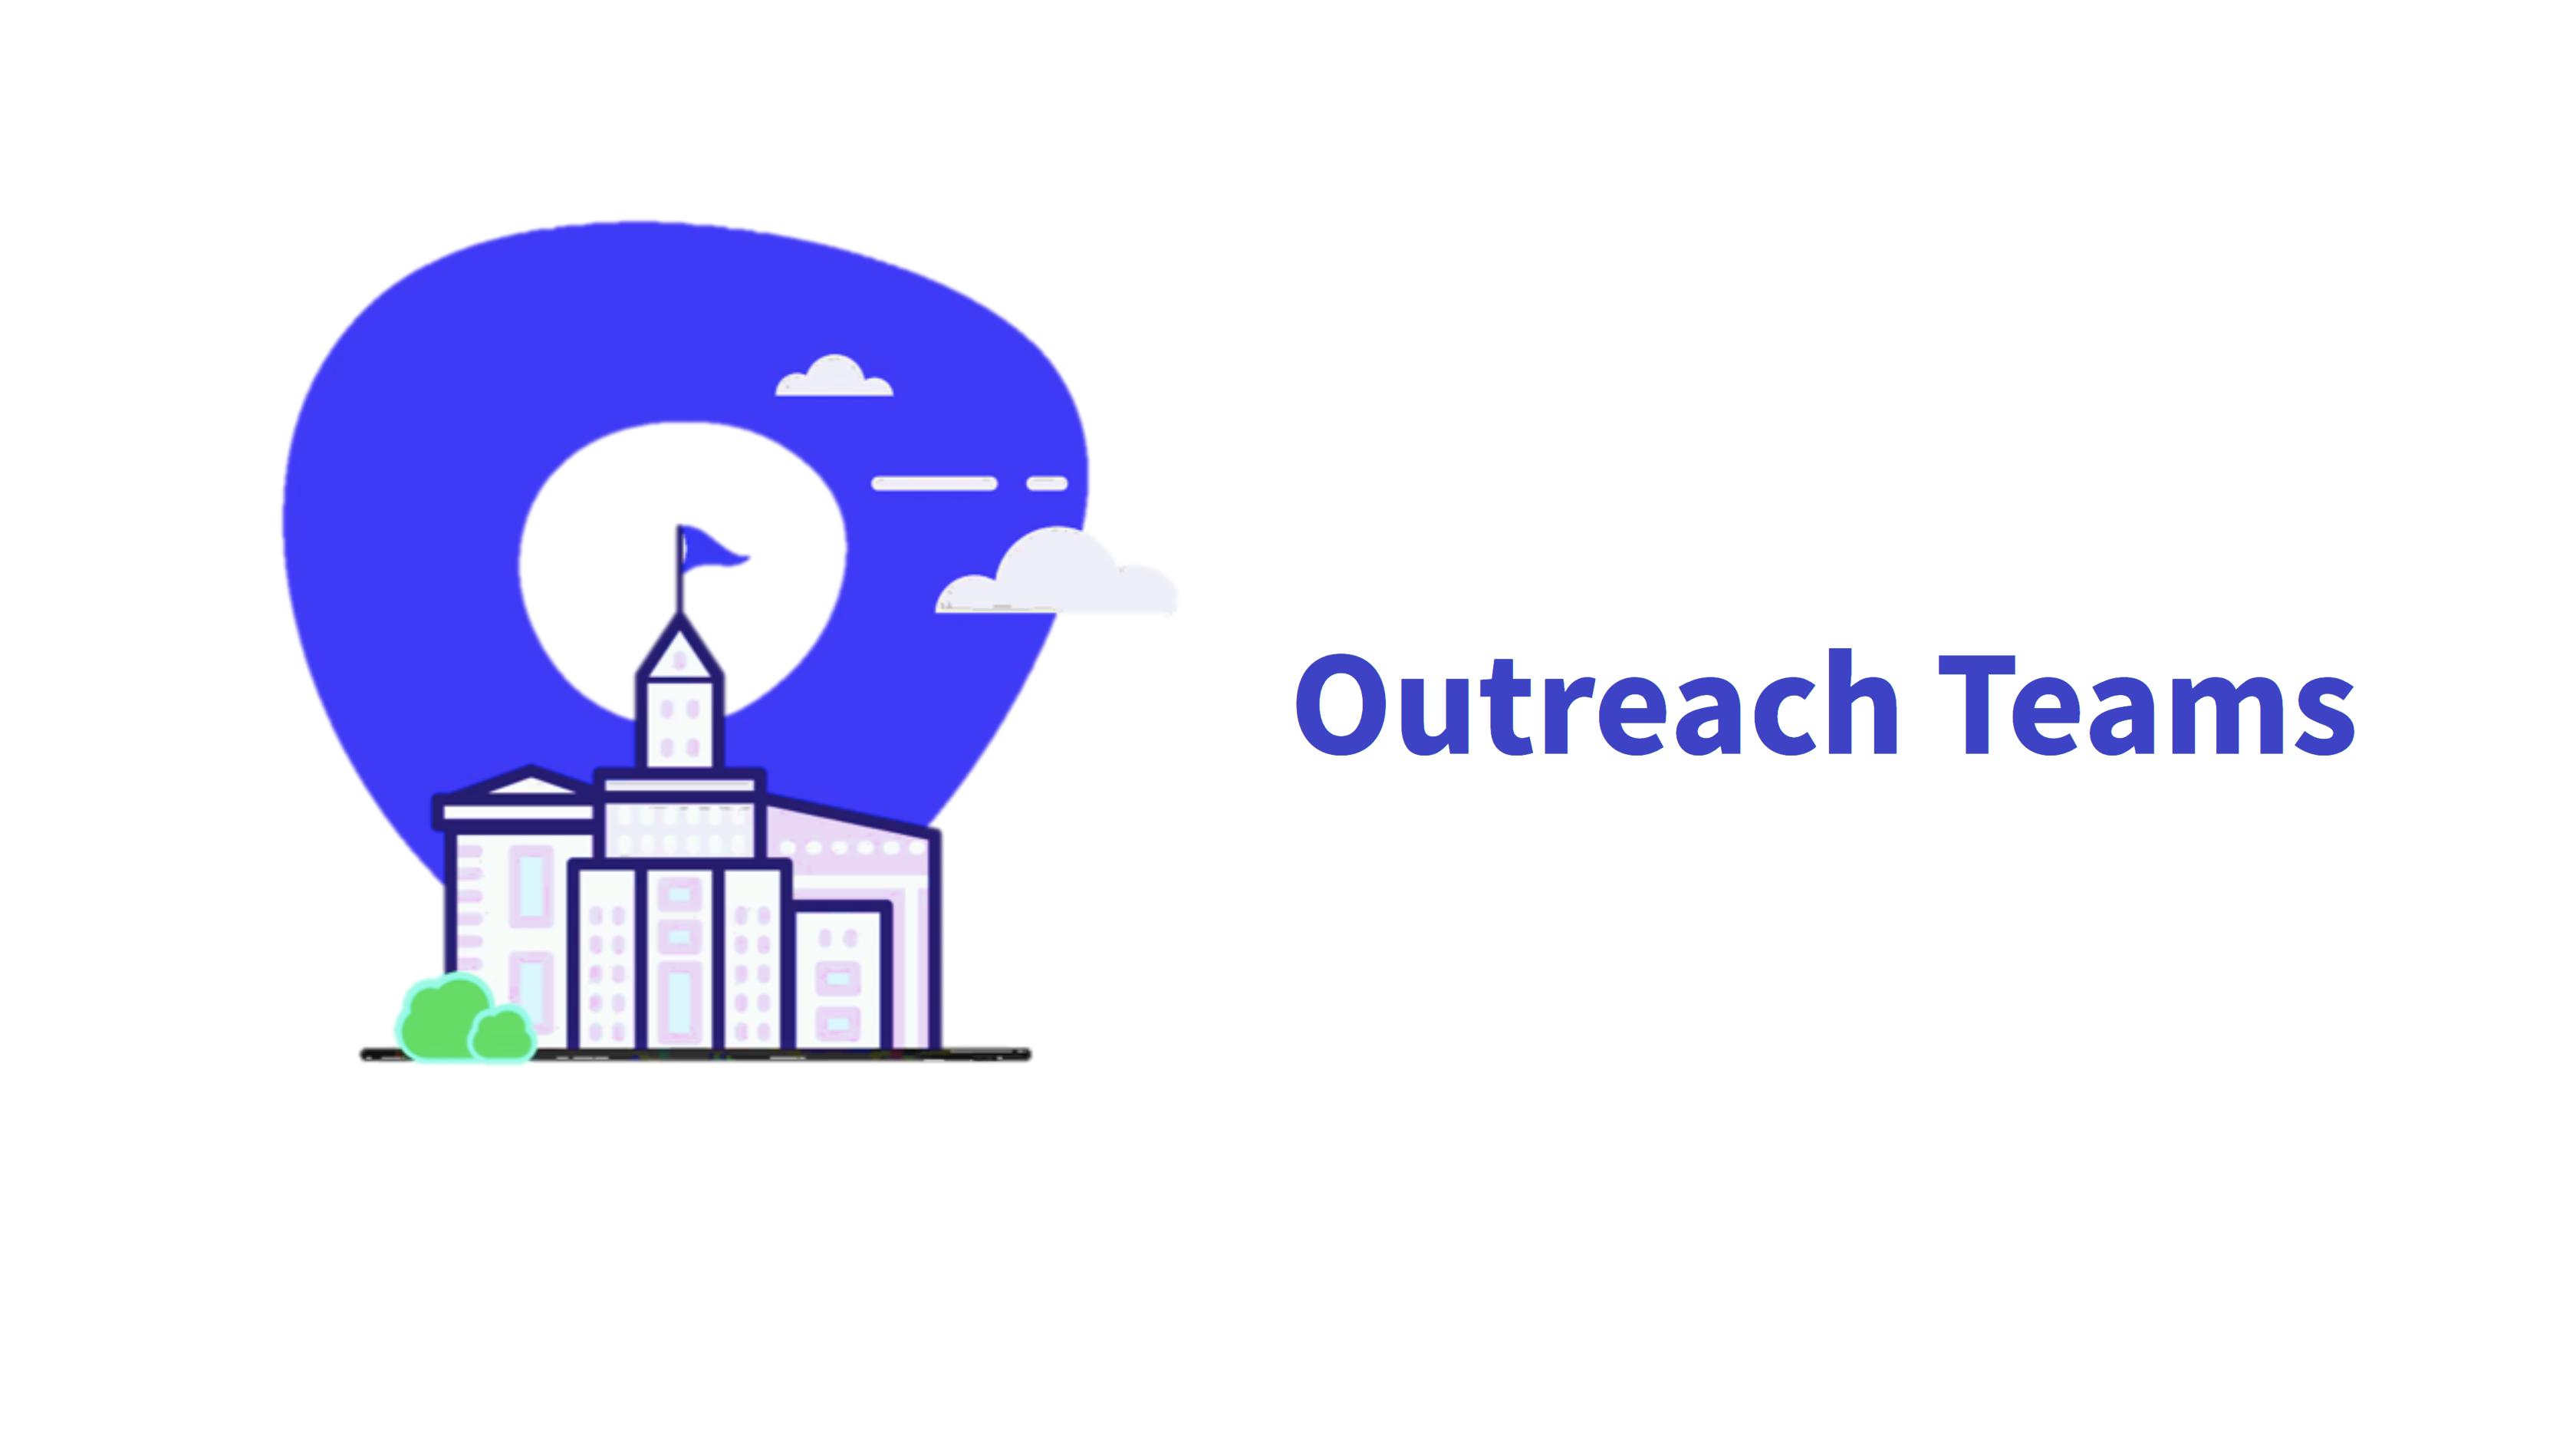 Outreach Teams